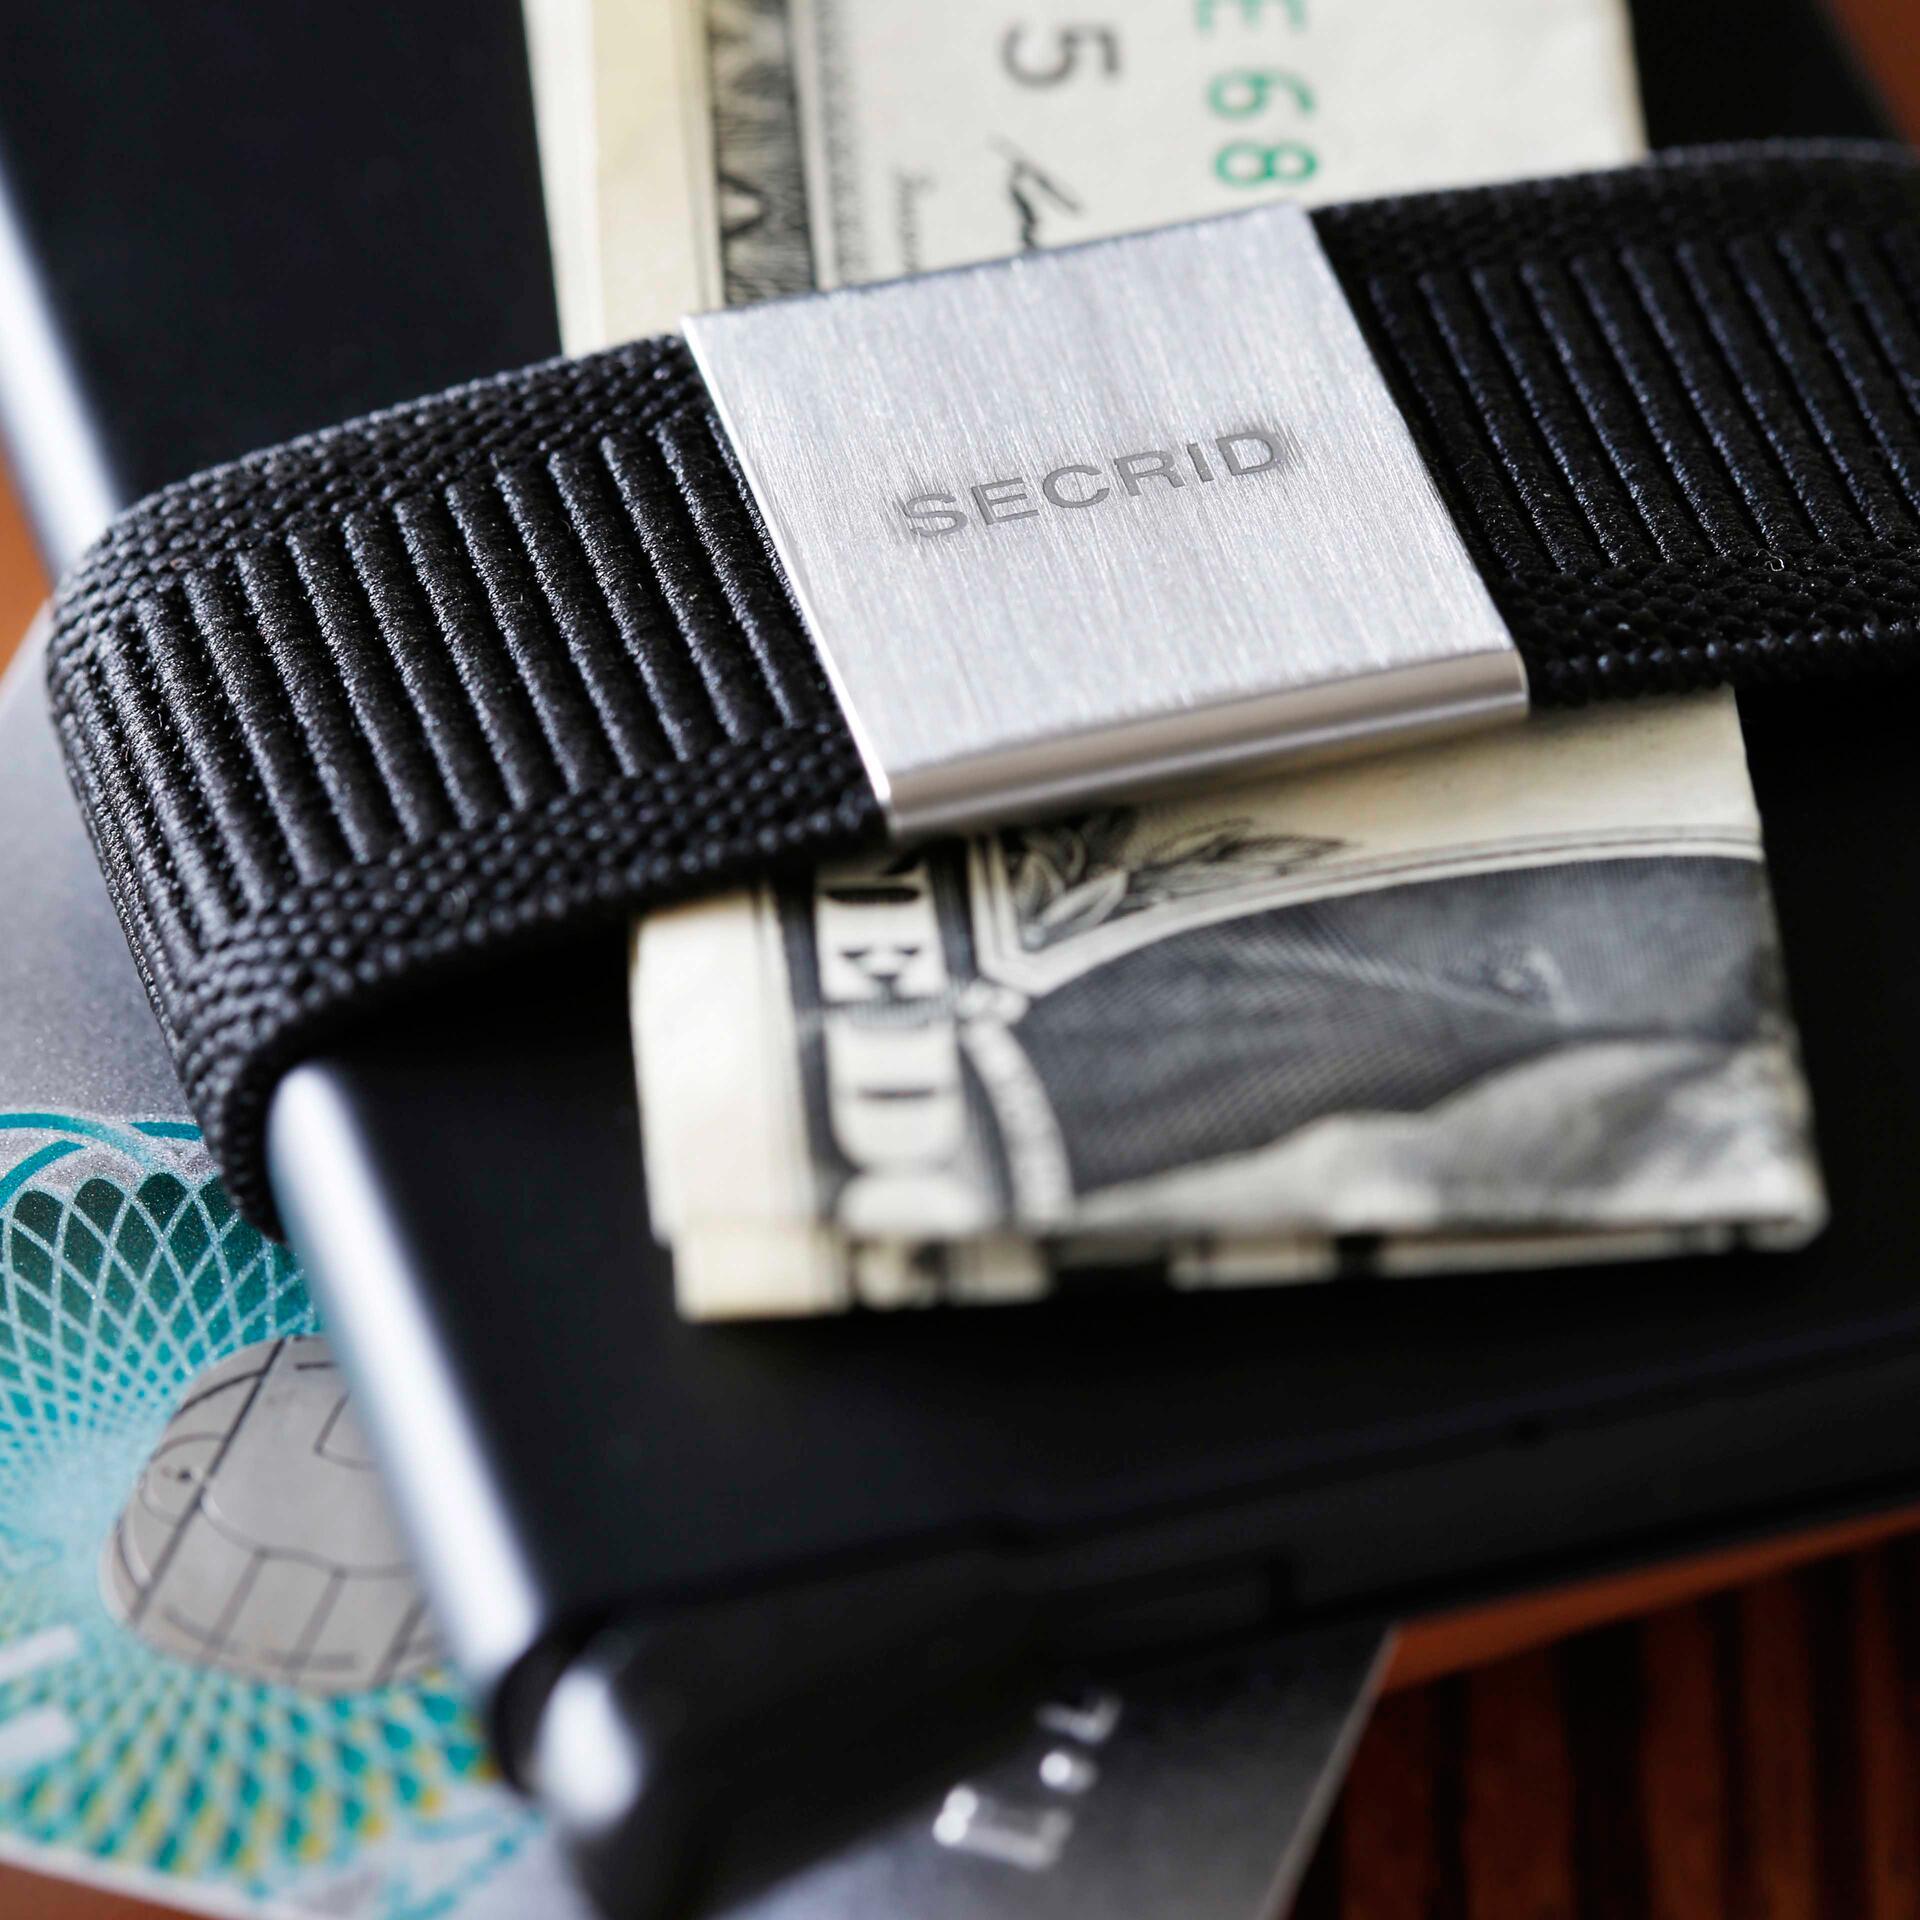 Secrid Moneyband Tire